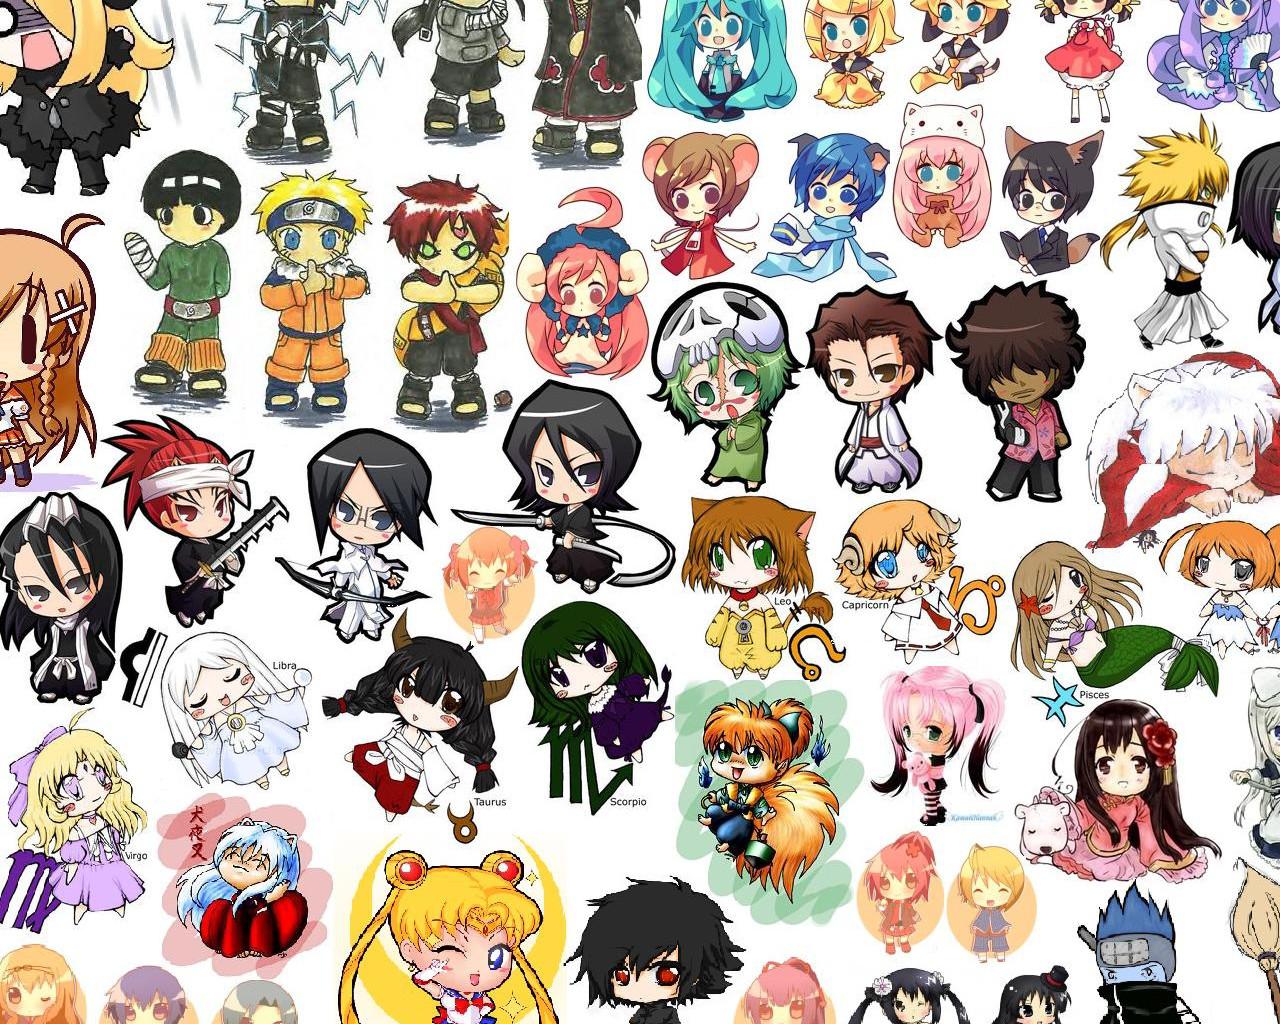 Claymore Wallpaper Hd Modifikasimobilpickup Anime Chibi Images